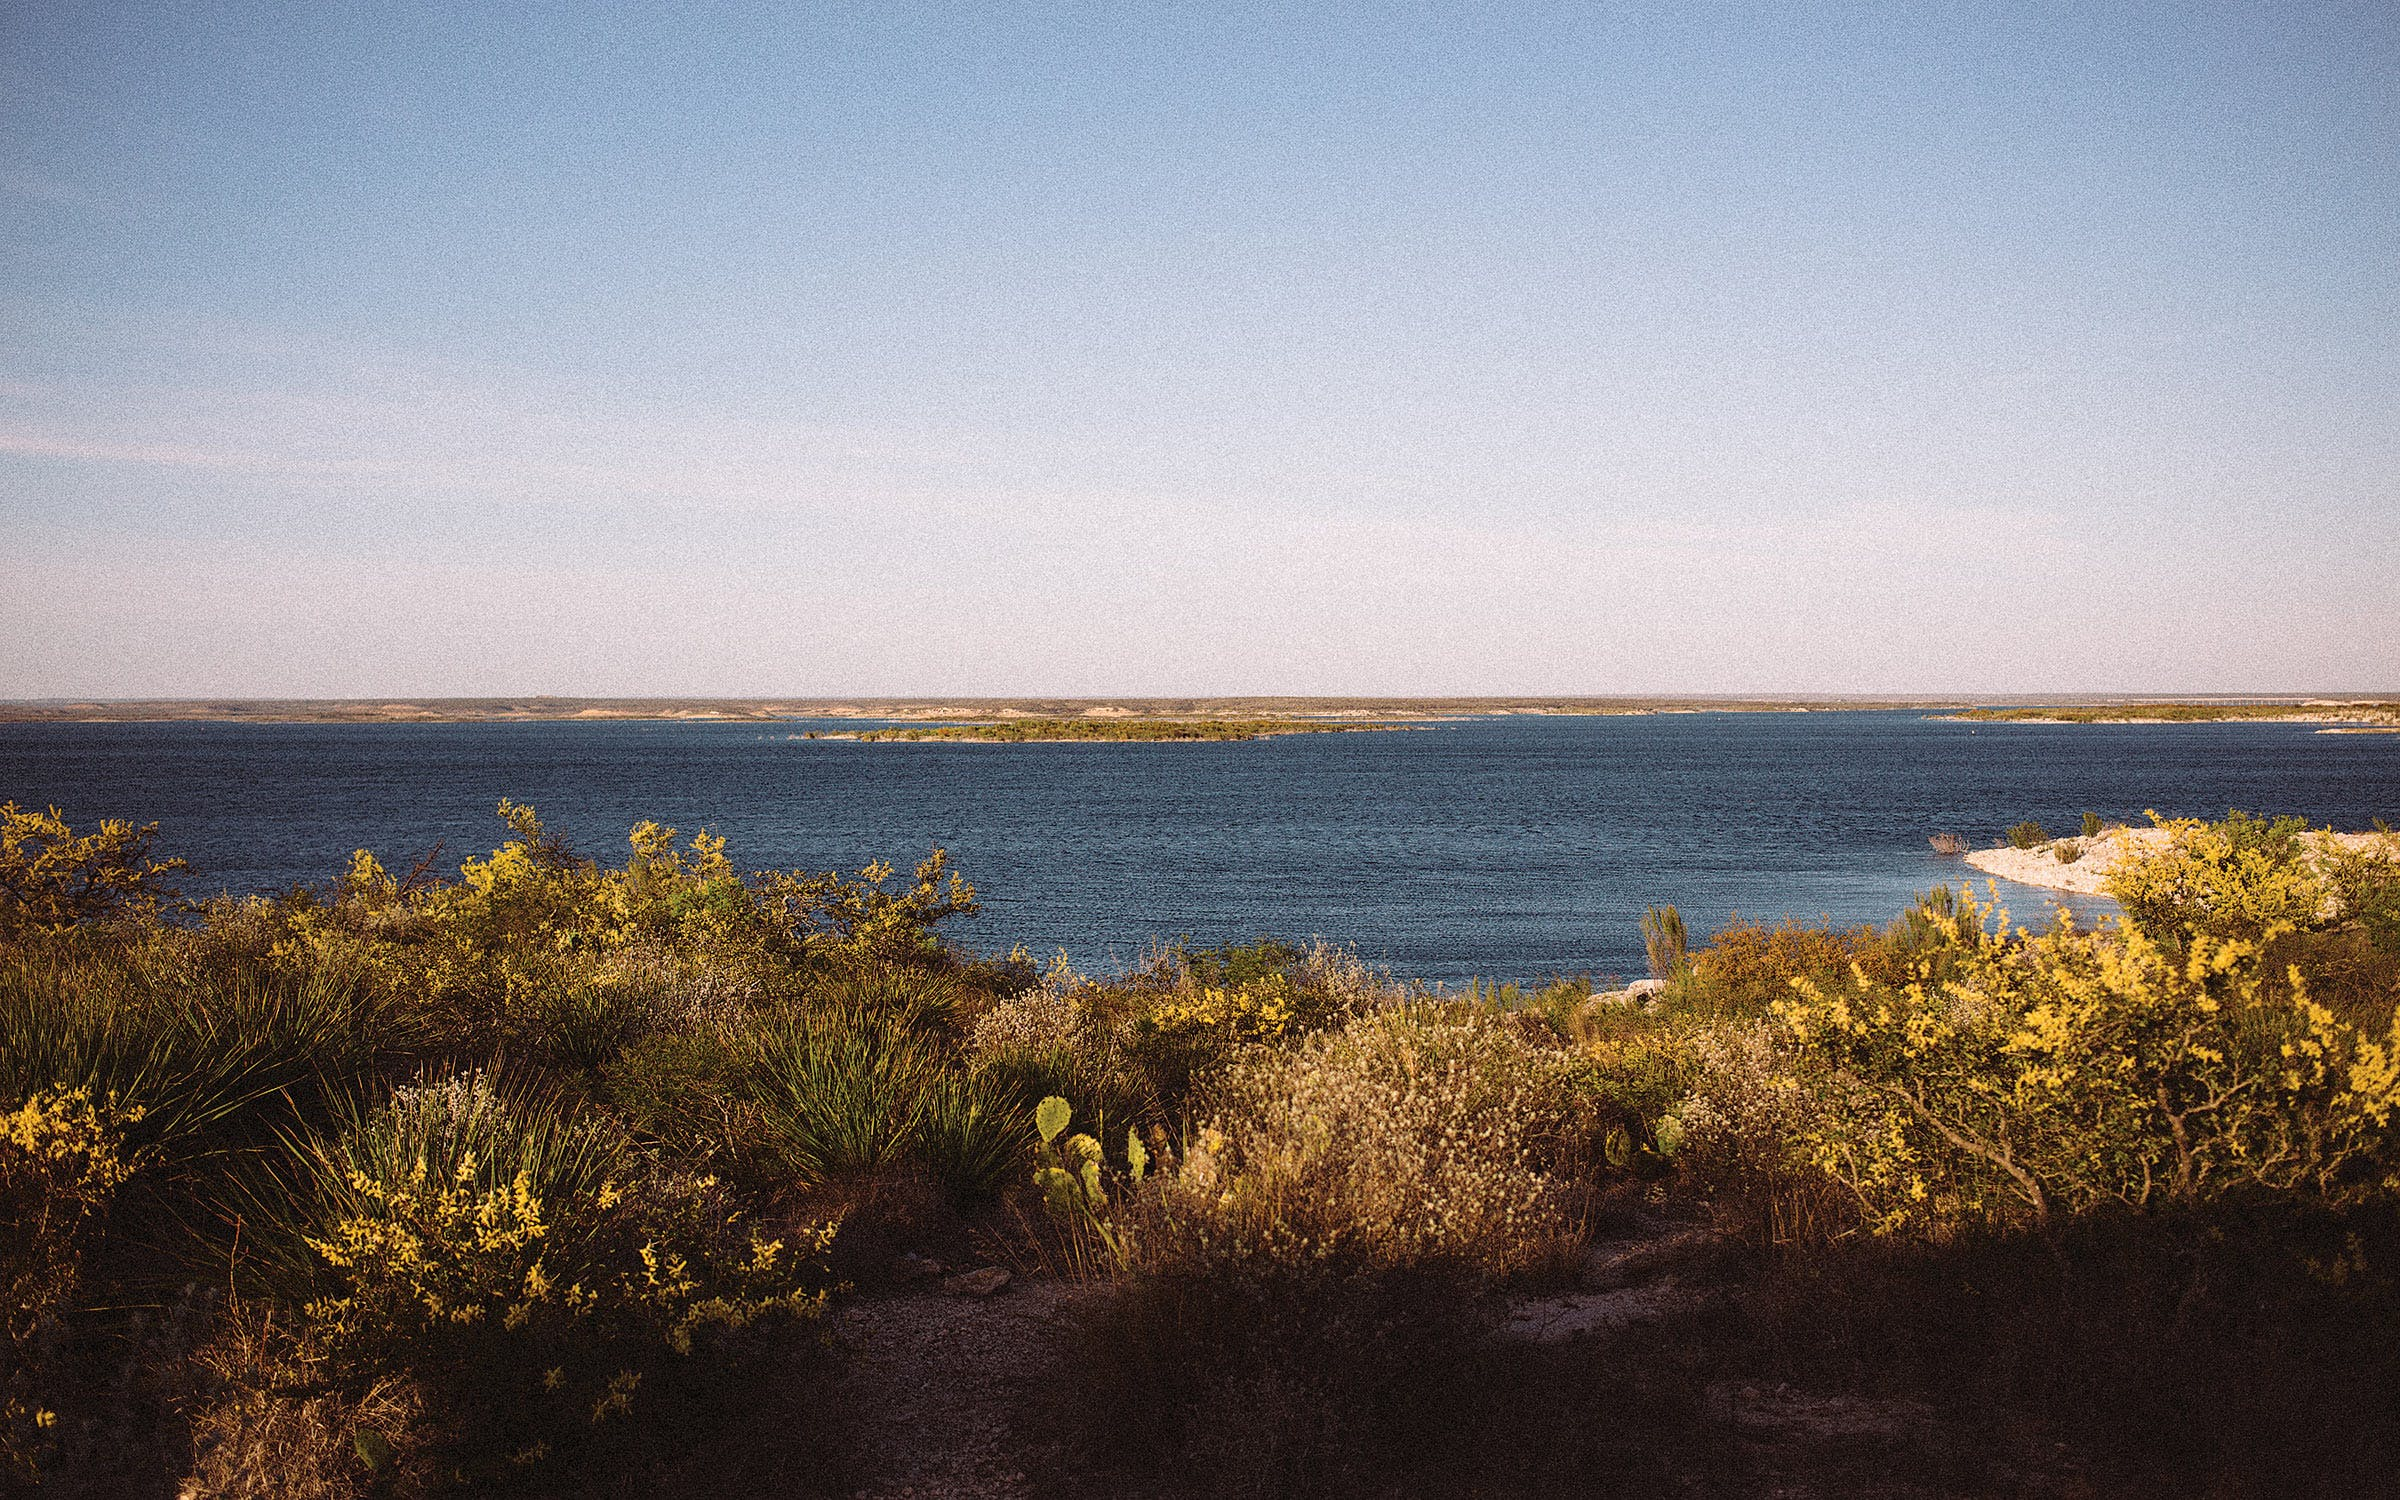 Amistad National Recreation Area, near Del Rio